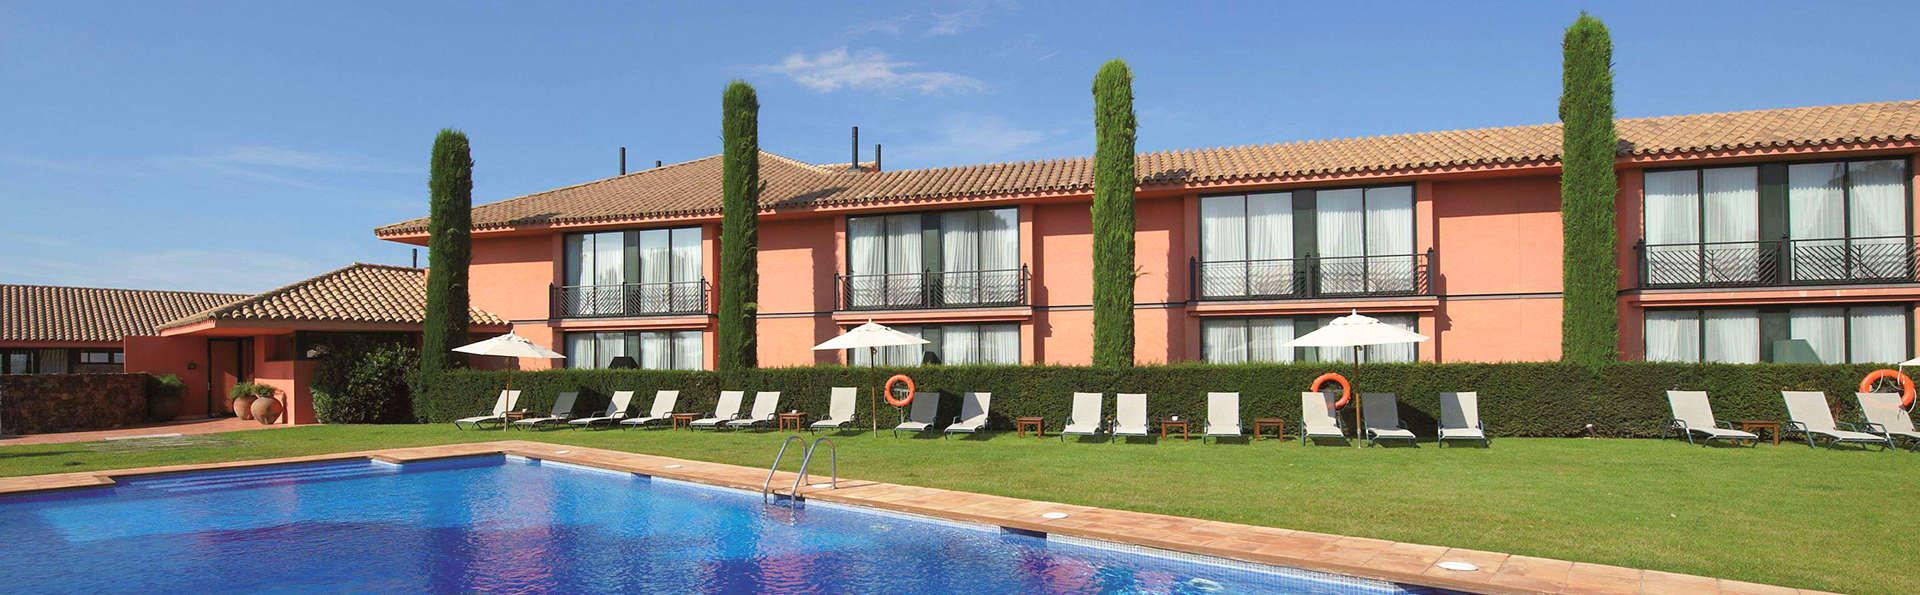 TorreMirona Golf & Spa Resort - edit_pool.jpg